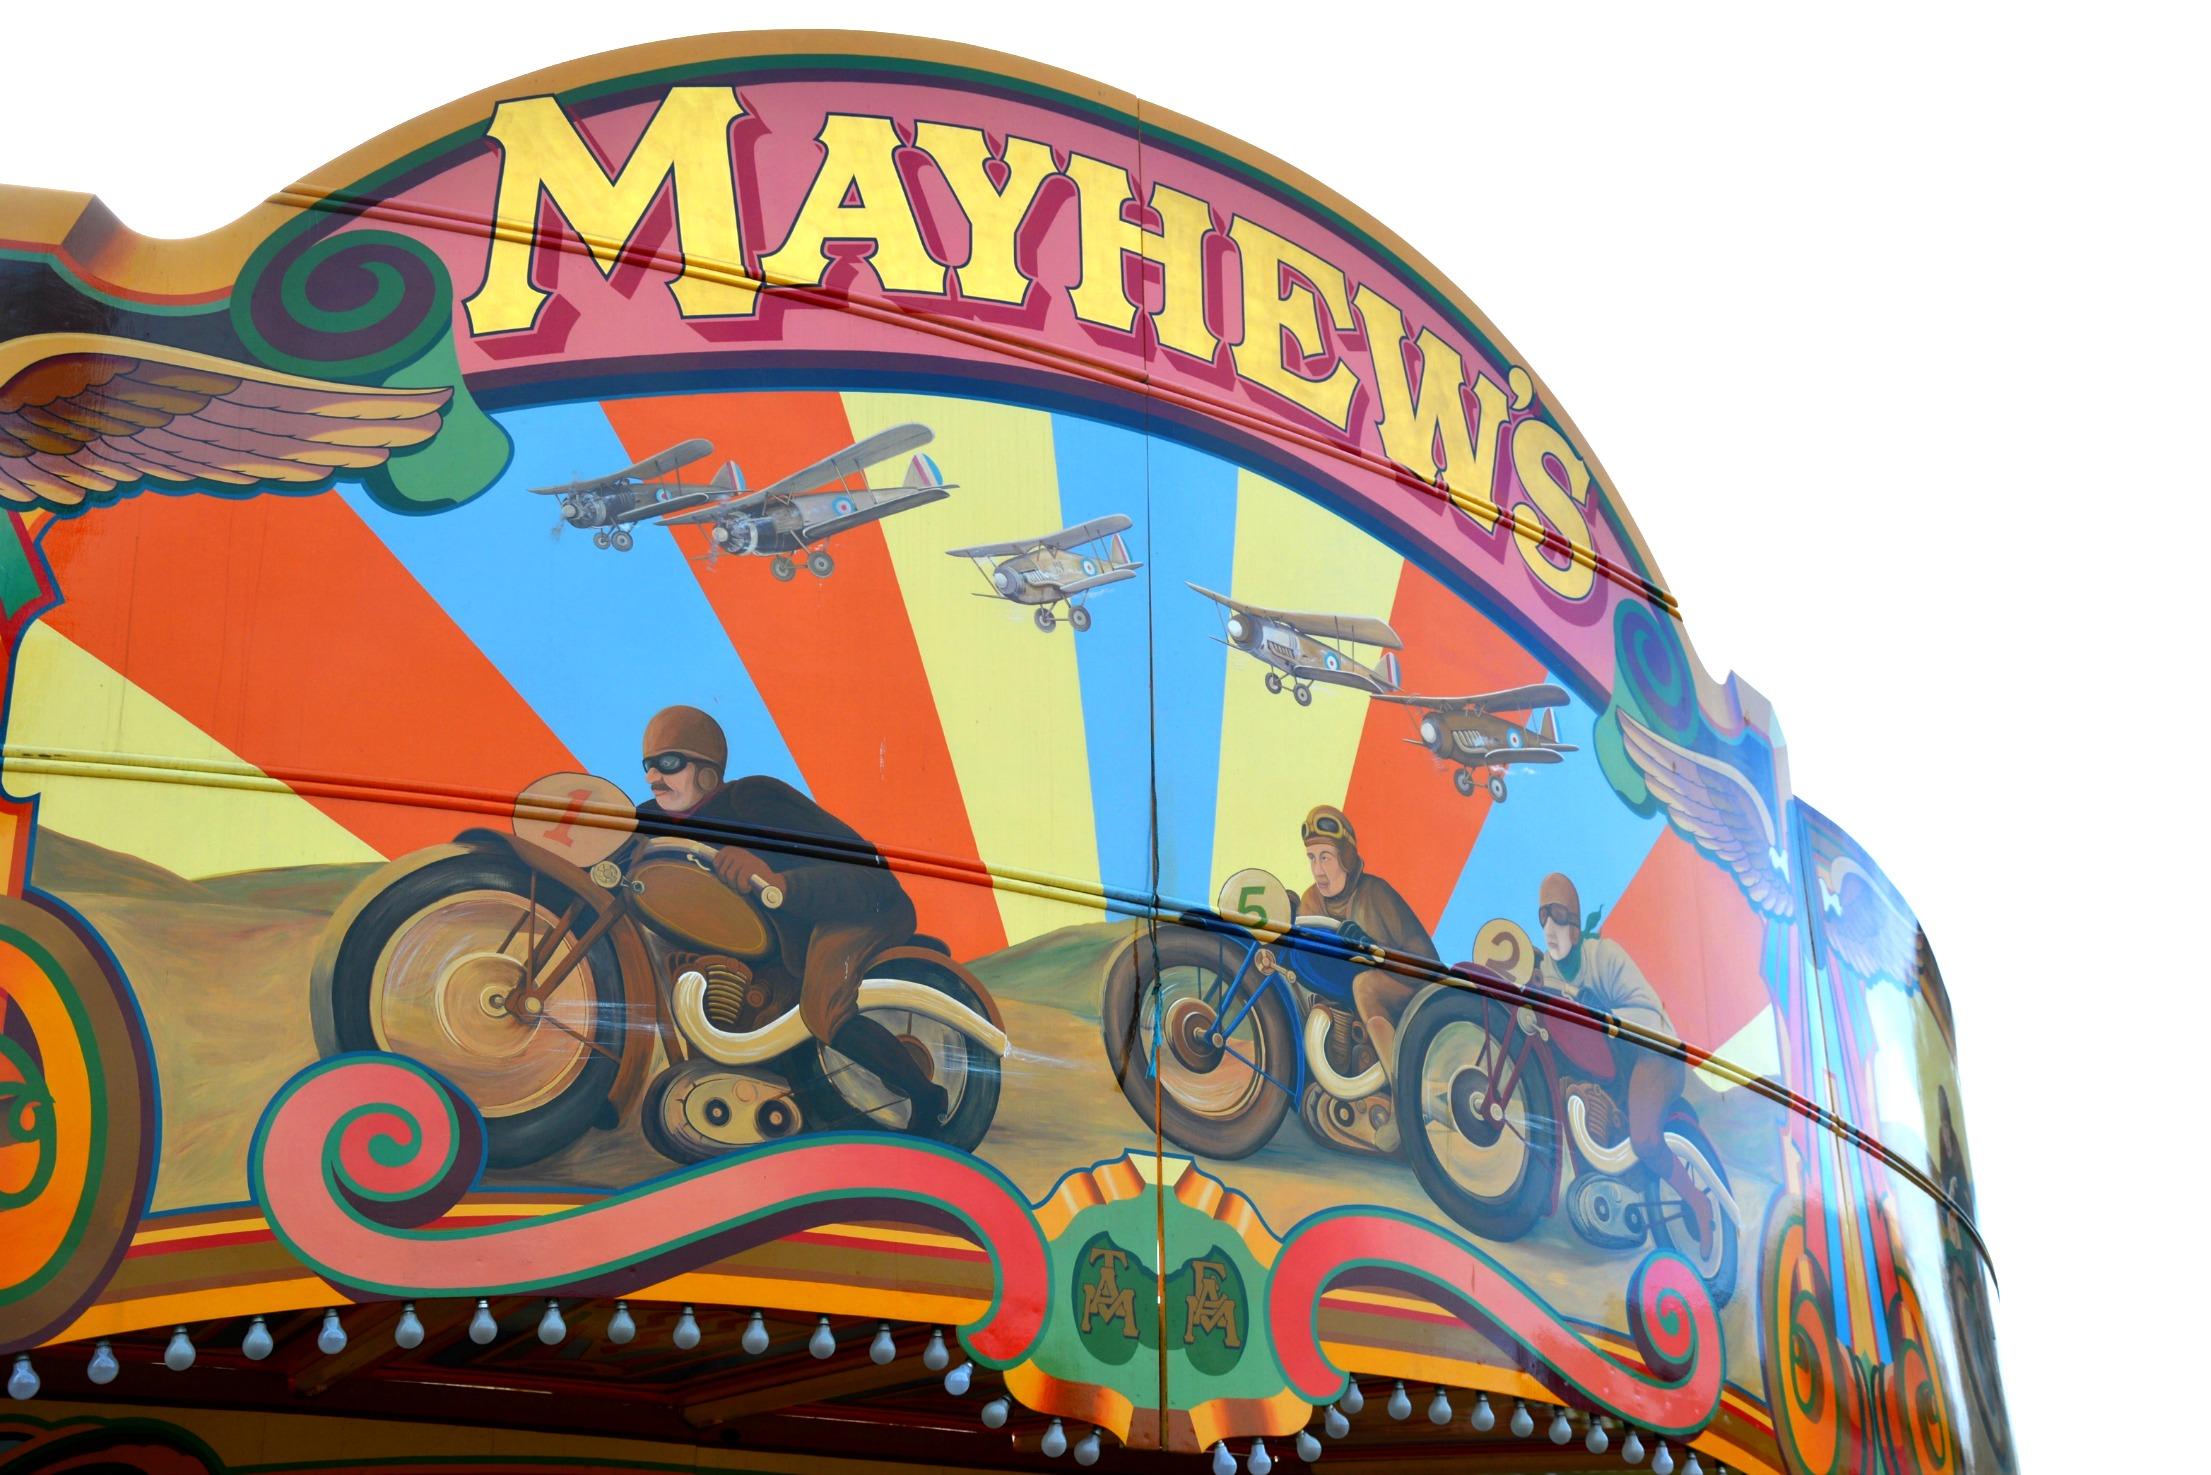 Mayhew's Speedway ride Dreamland